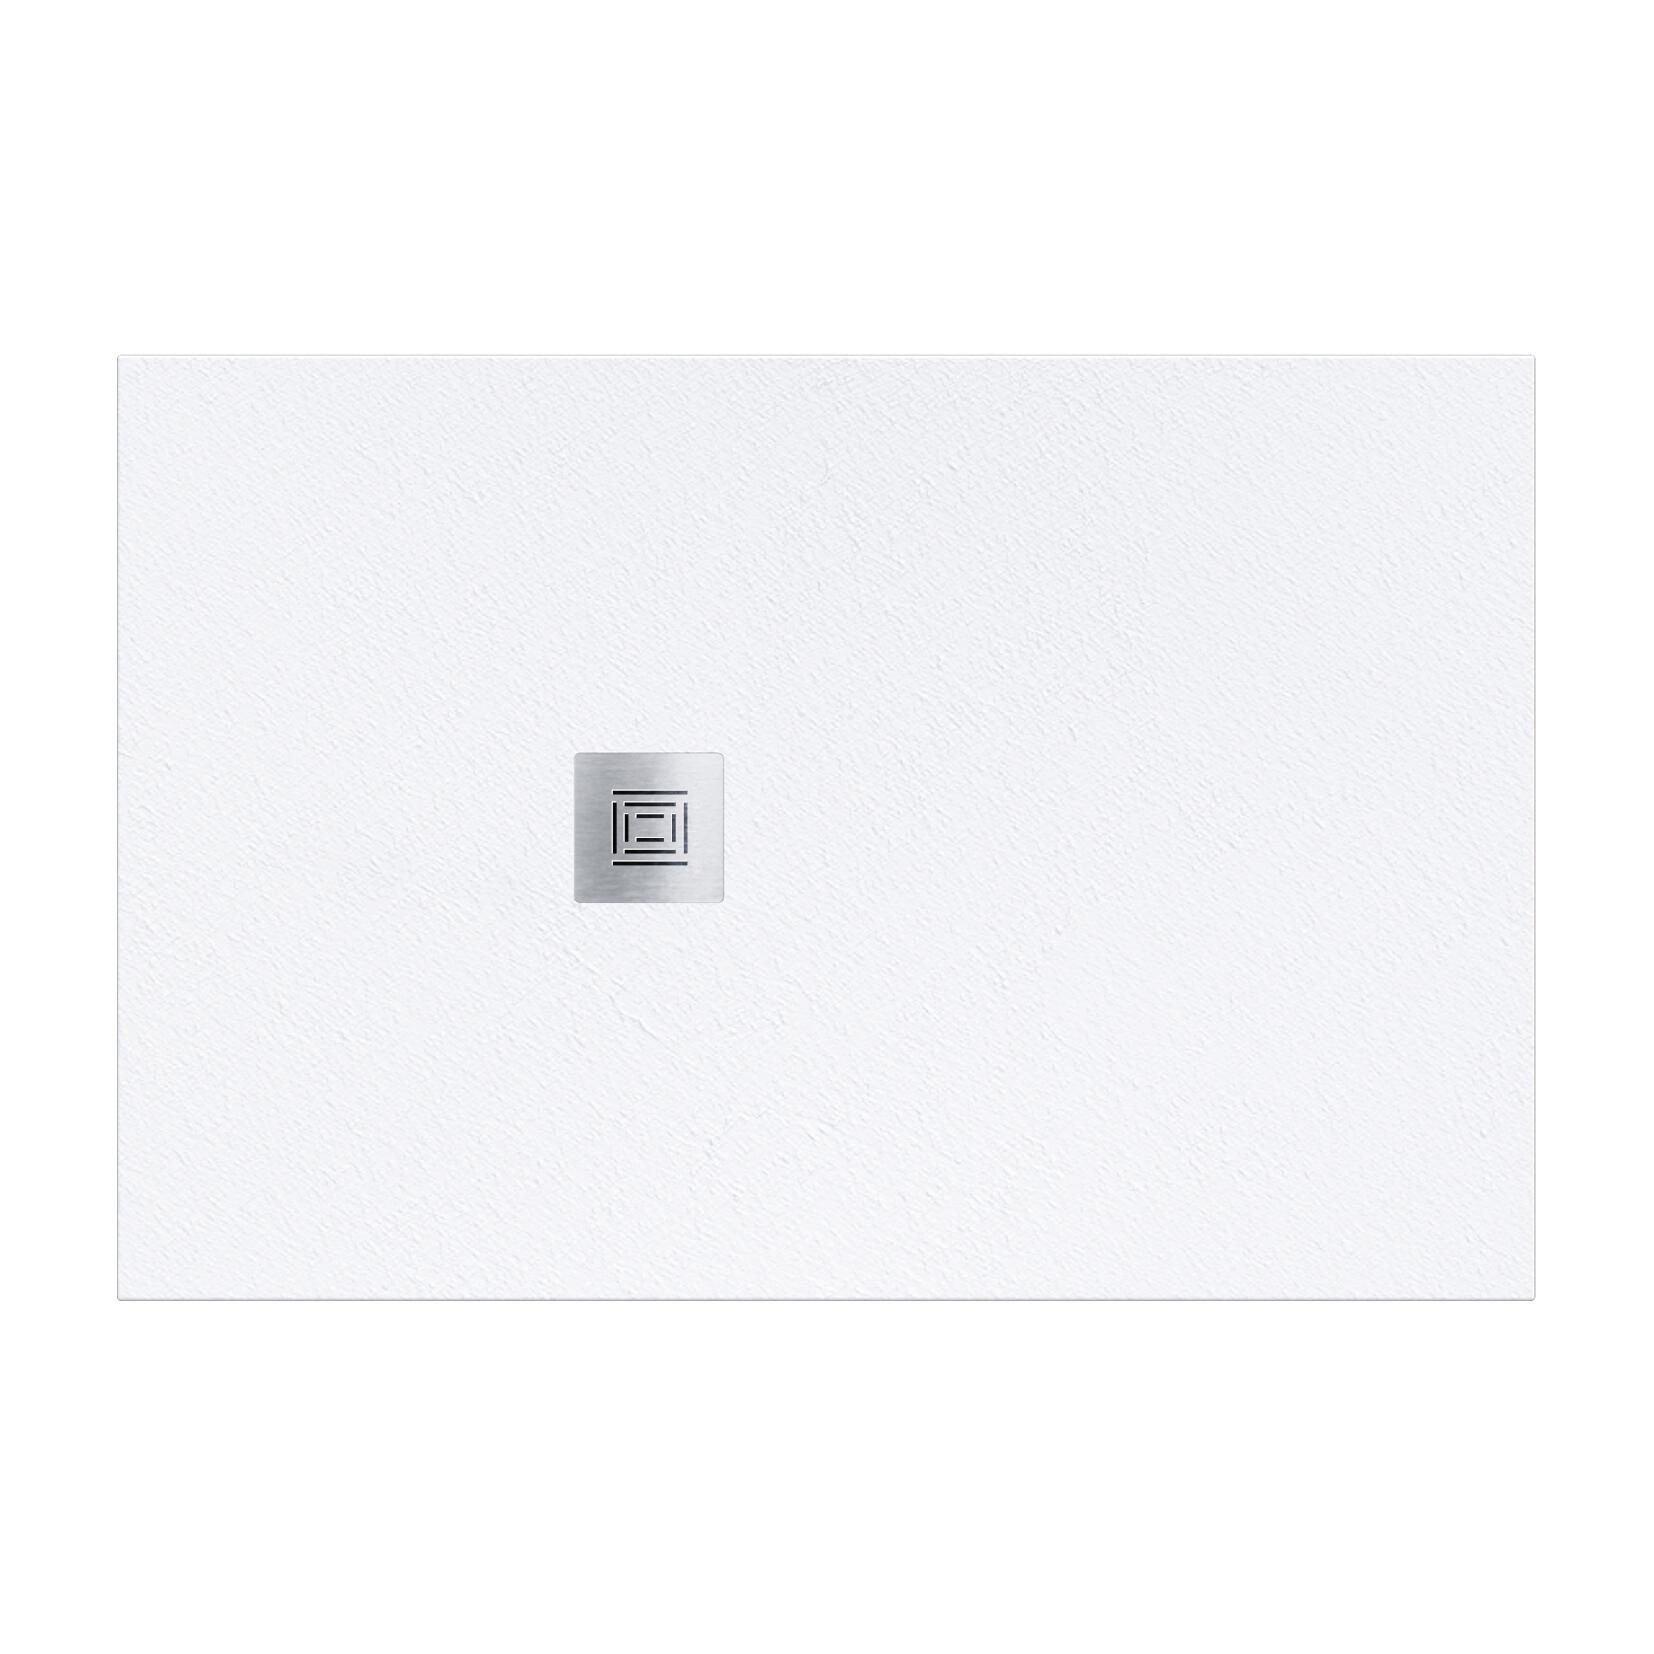 Piatto doccia resina Logic 80 x 100 cm bianco - 2